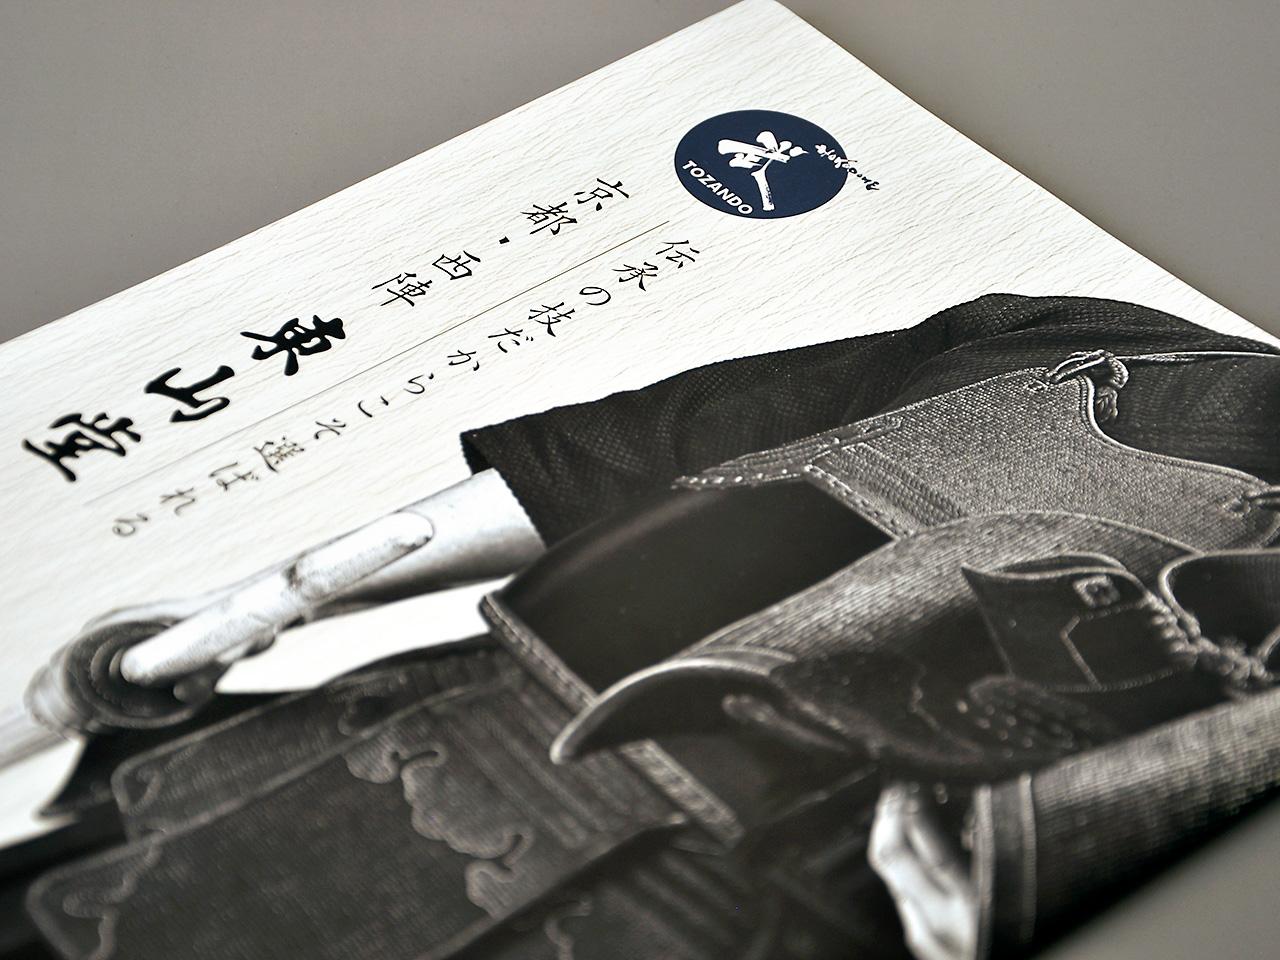 東山堂様 剣道防具カタログ